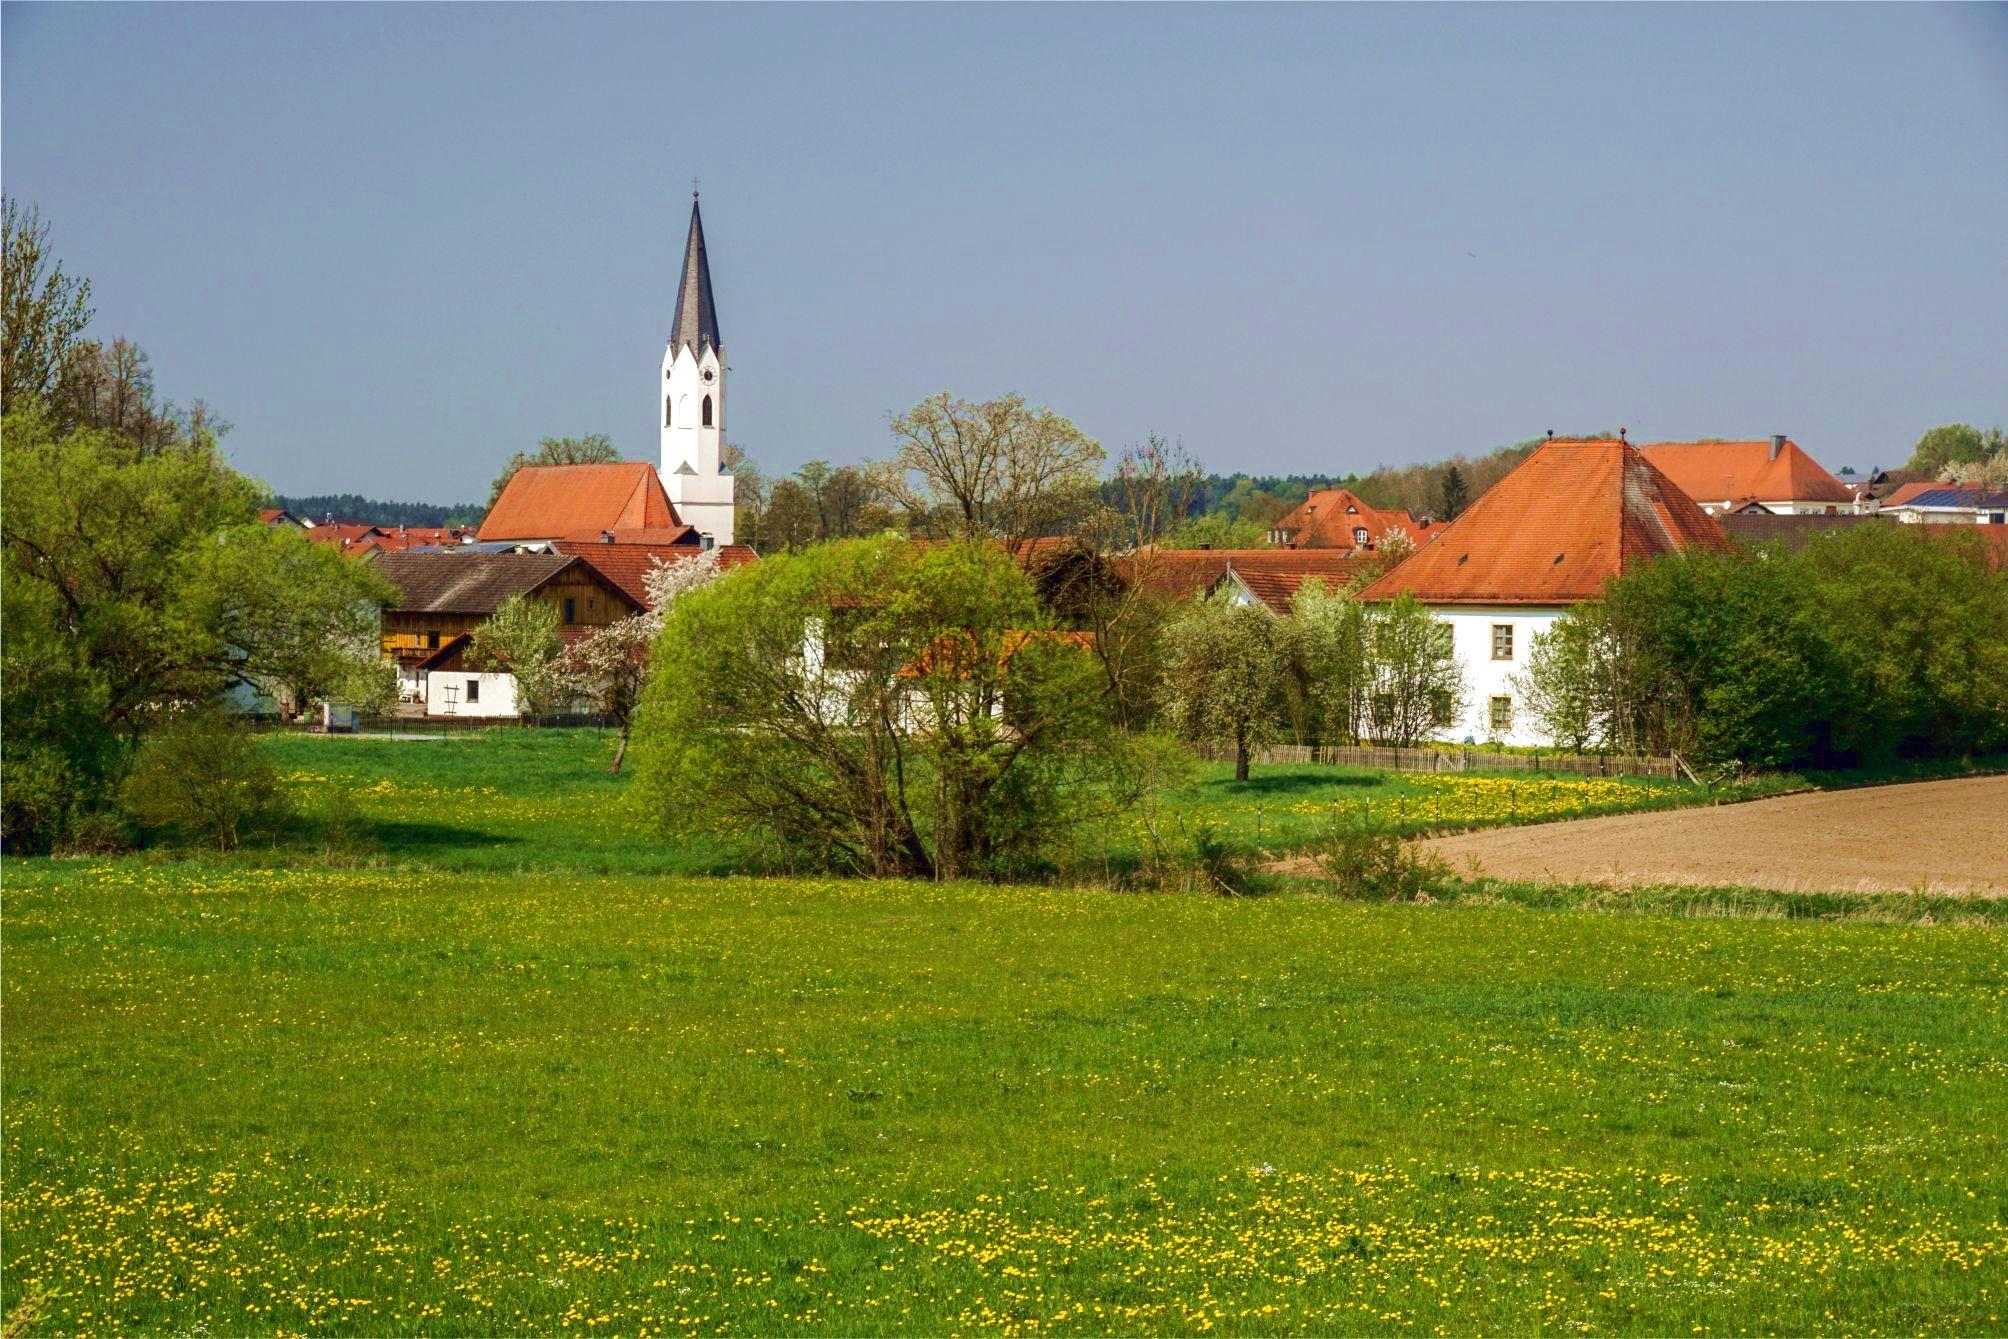 Malgersdorf